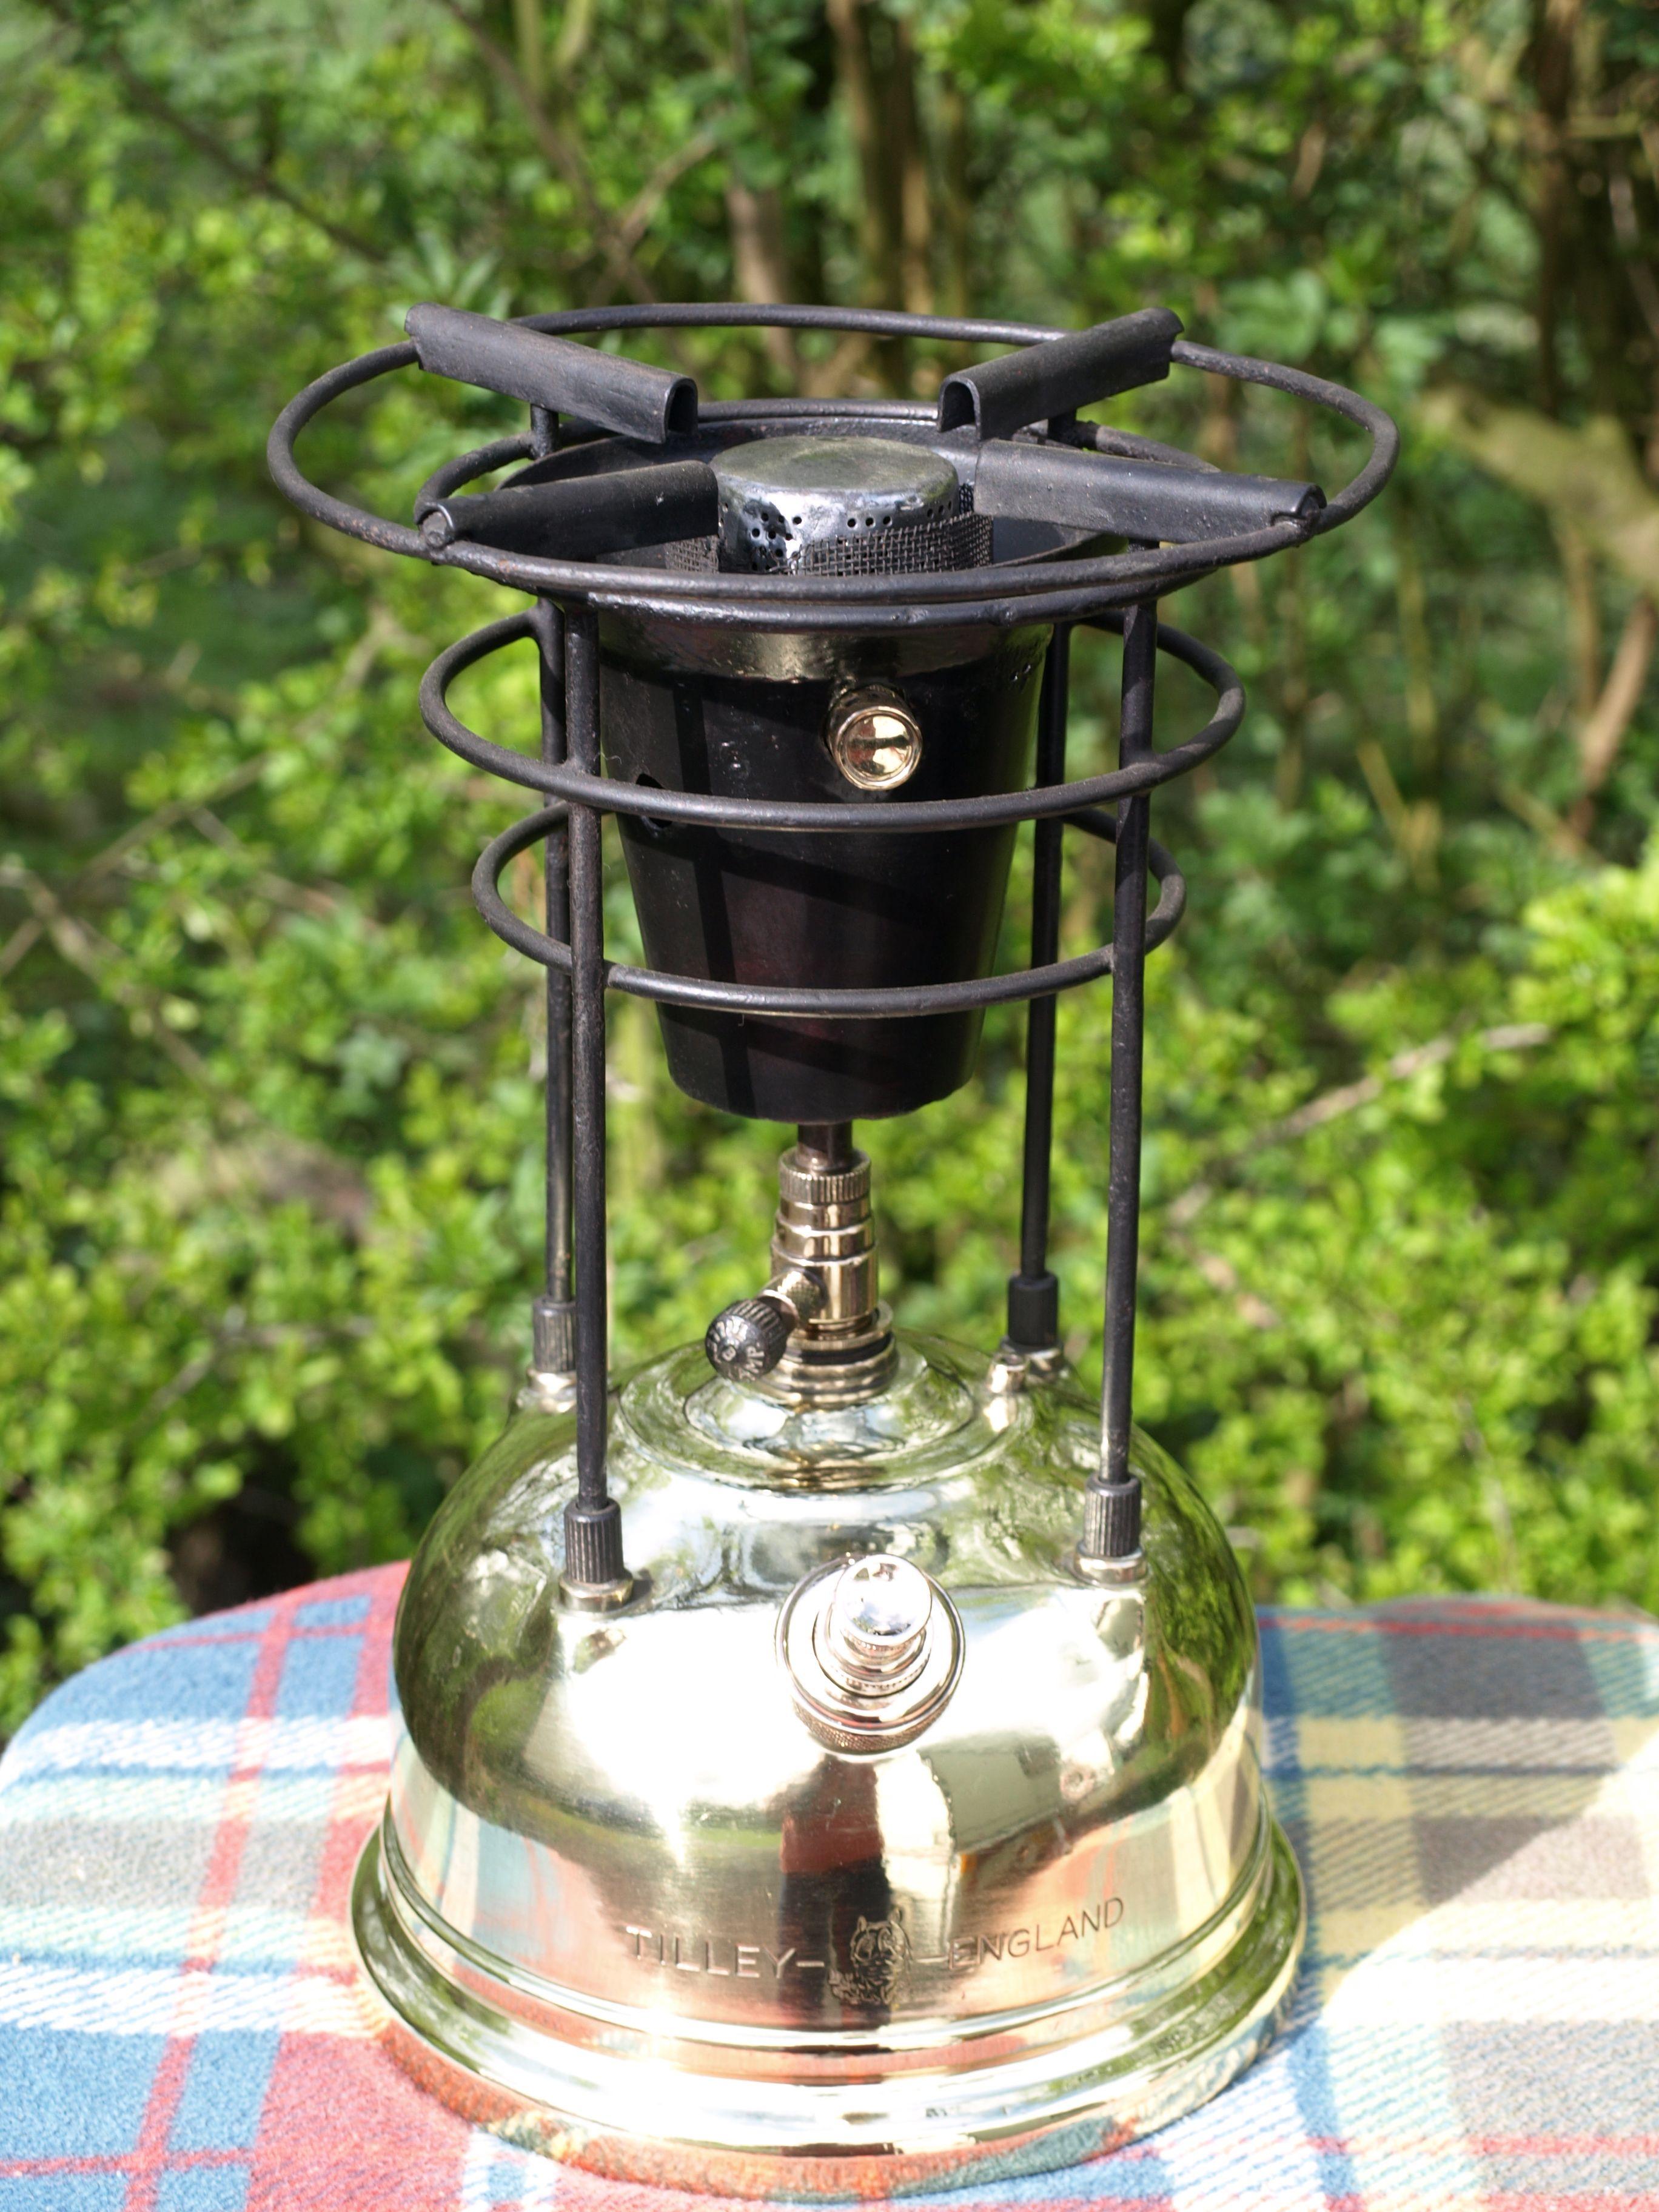 Tilley Lamp Stove Cs56 Pressure Lamps Pinterest